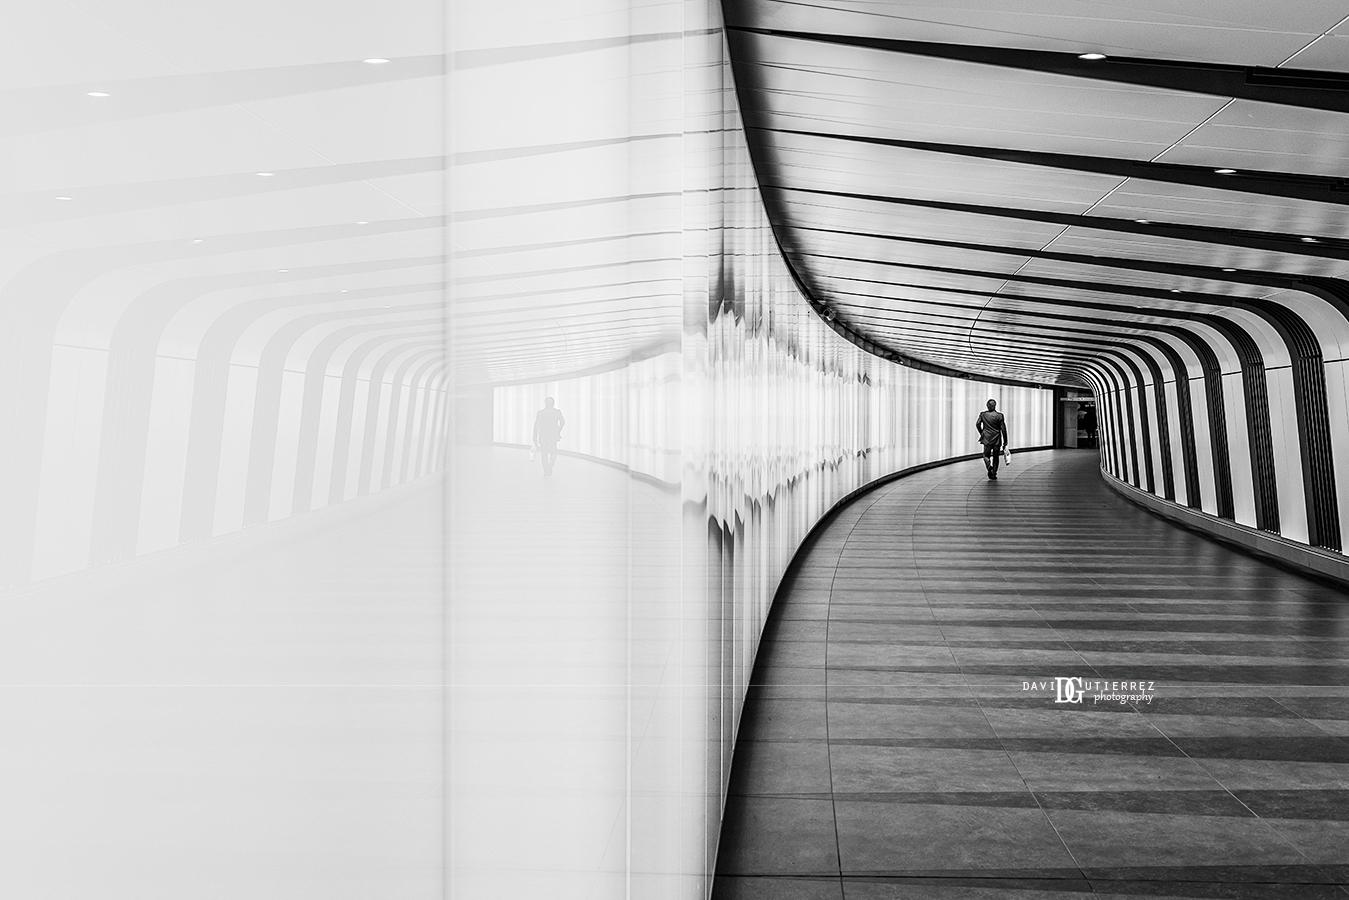 """Stripes"" King's Cross St. Pancras Station, London, United Kingdom by David Gutierrez Photography, London Photographer"